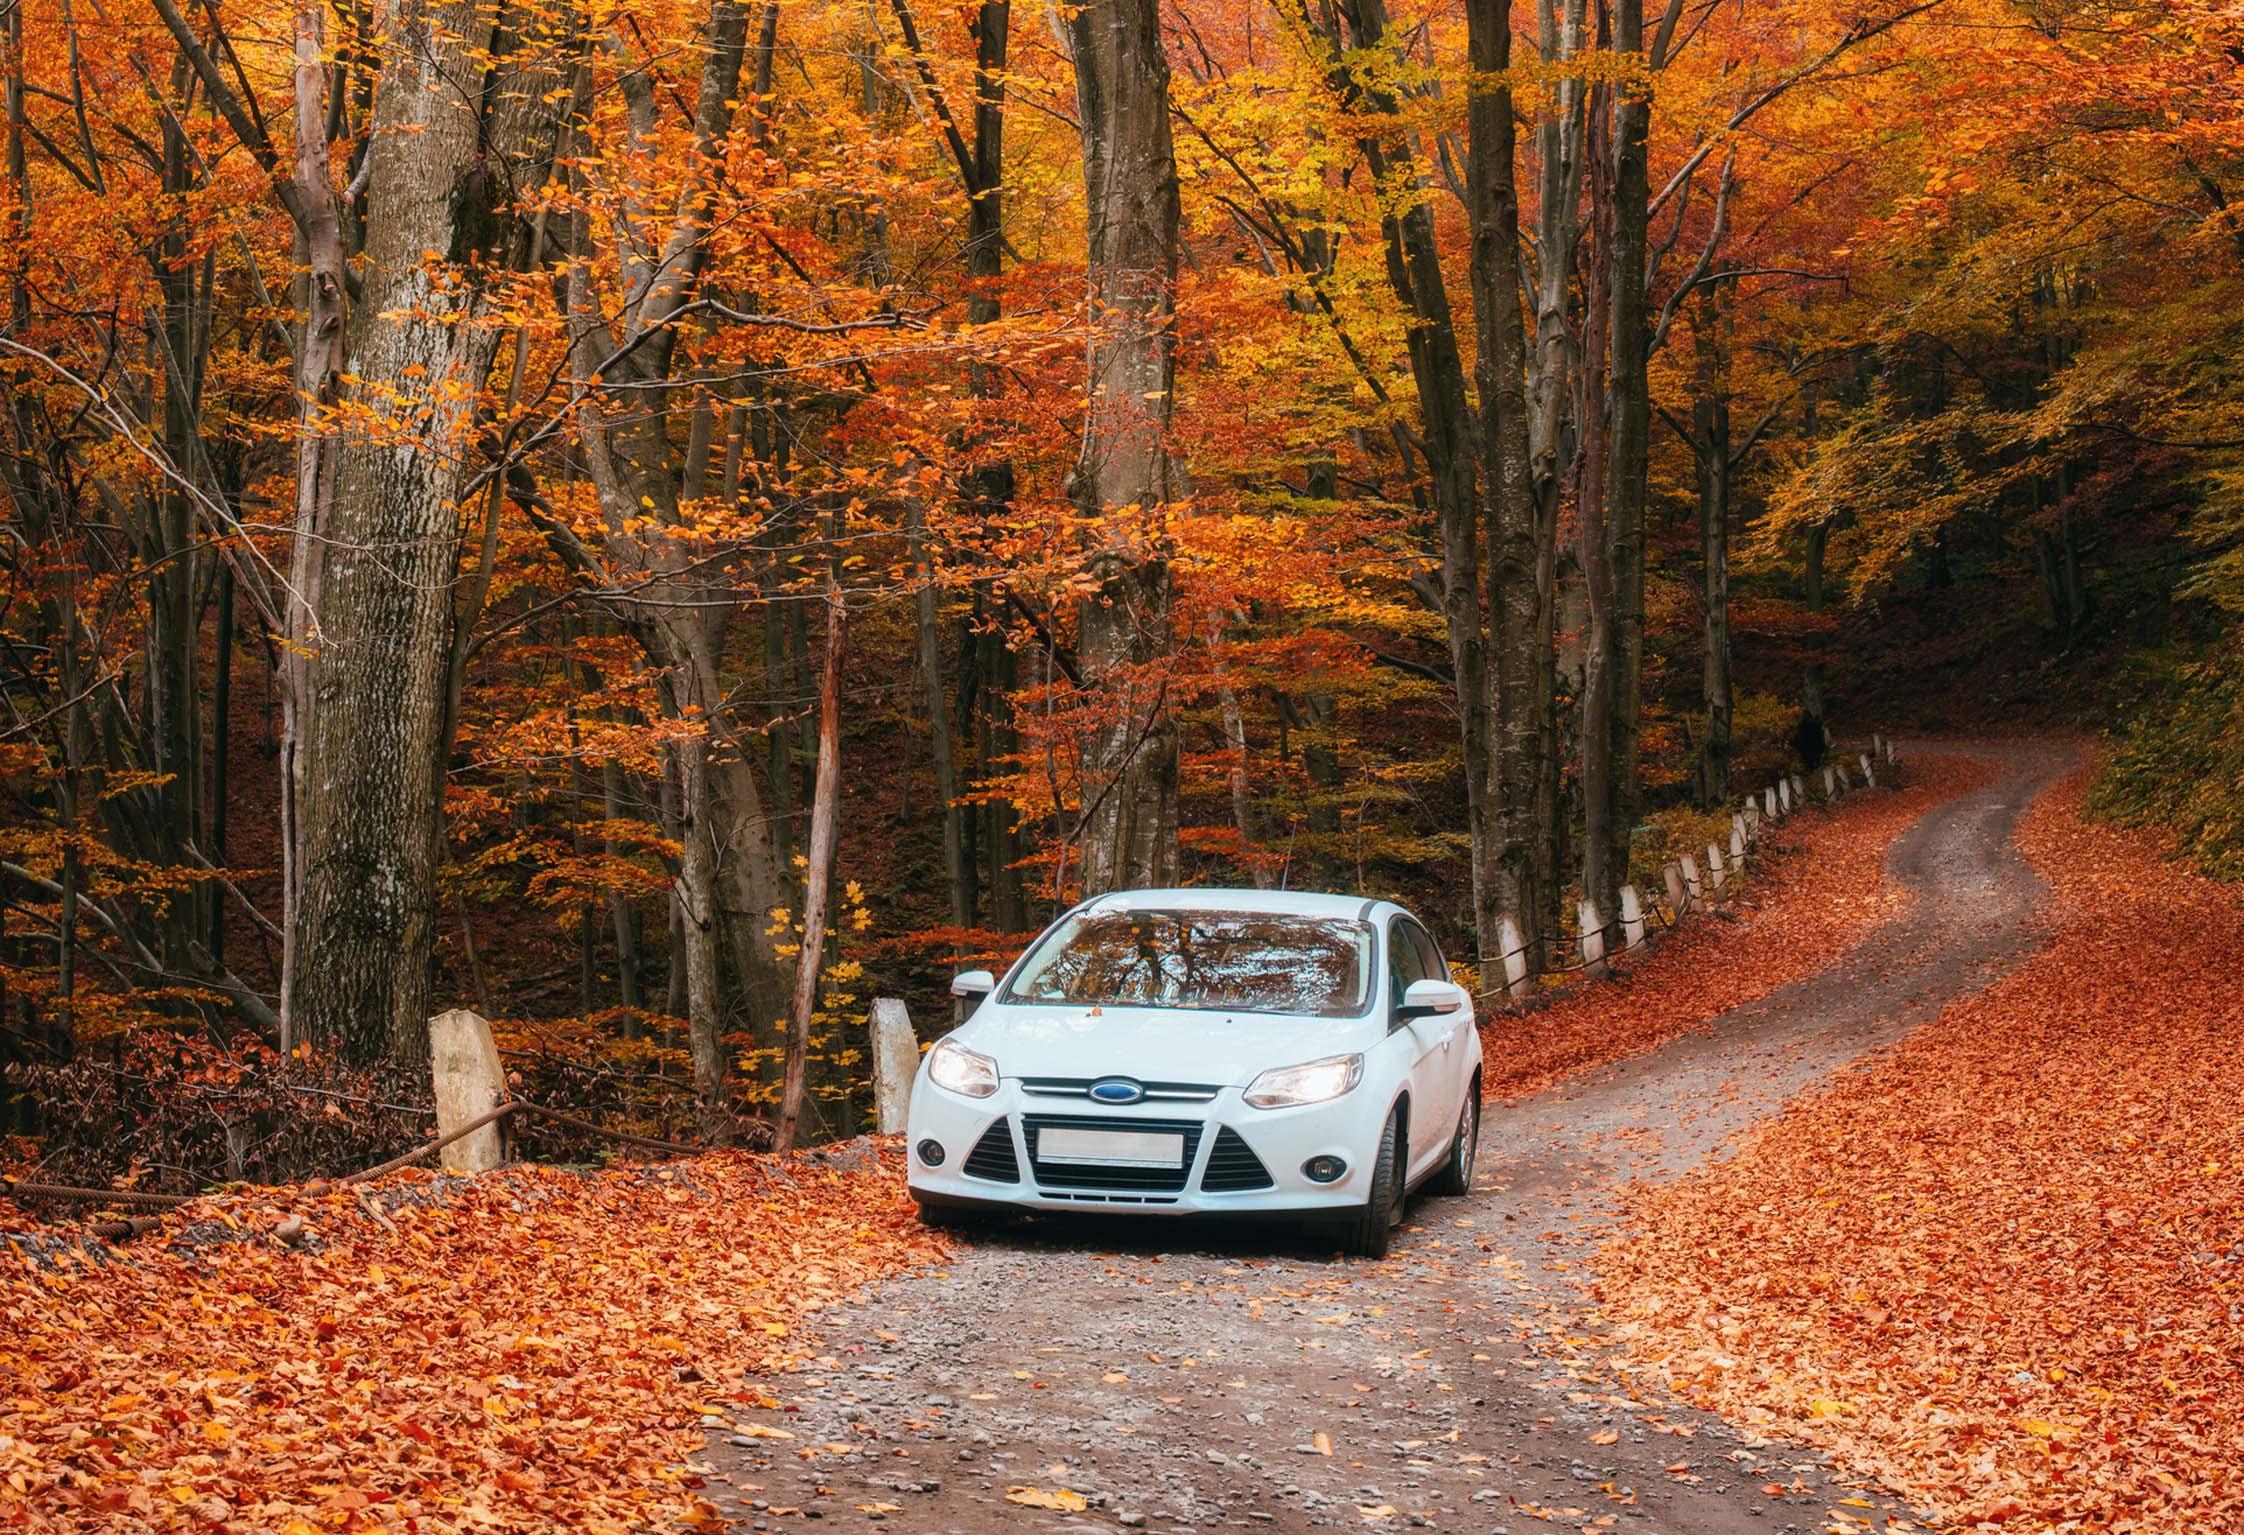 BLOG: Autumn driving tips | XLCR Vehicle Management Ltd